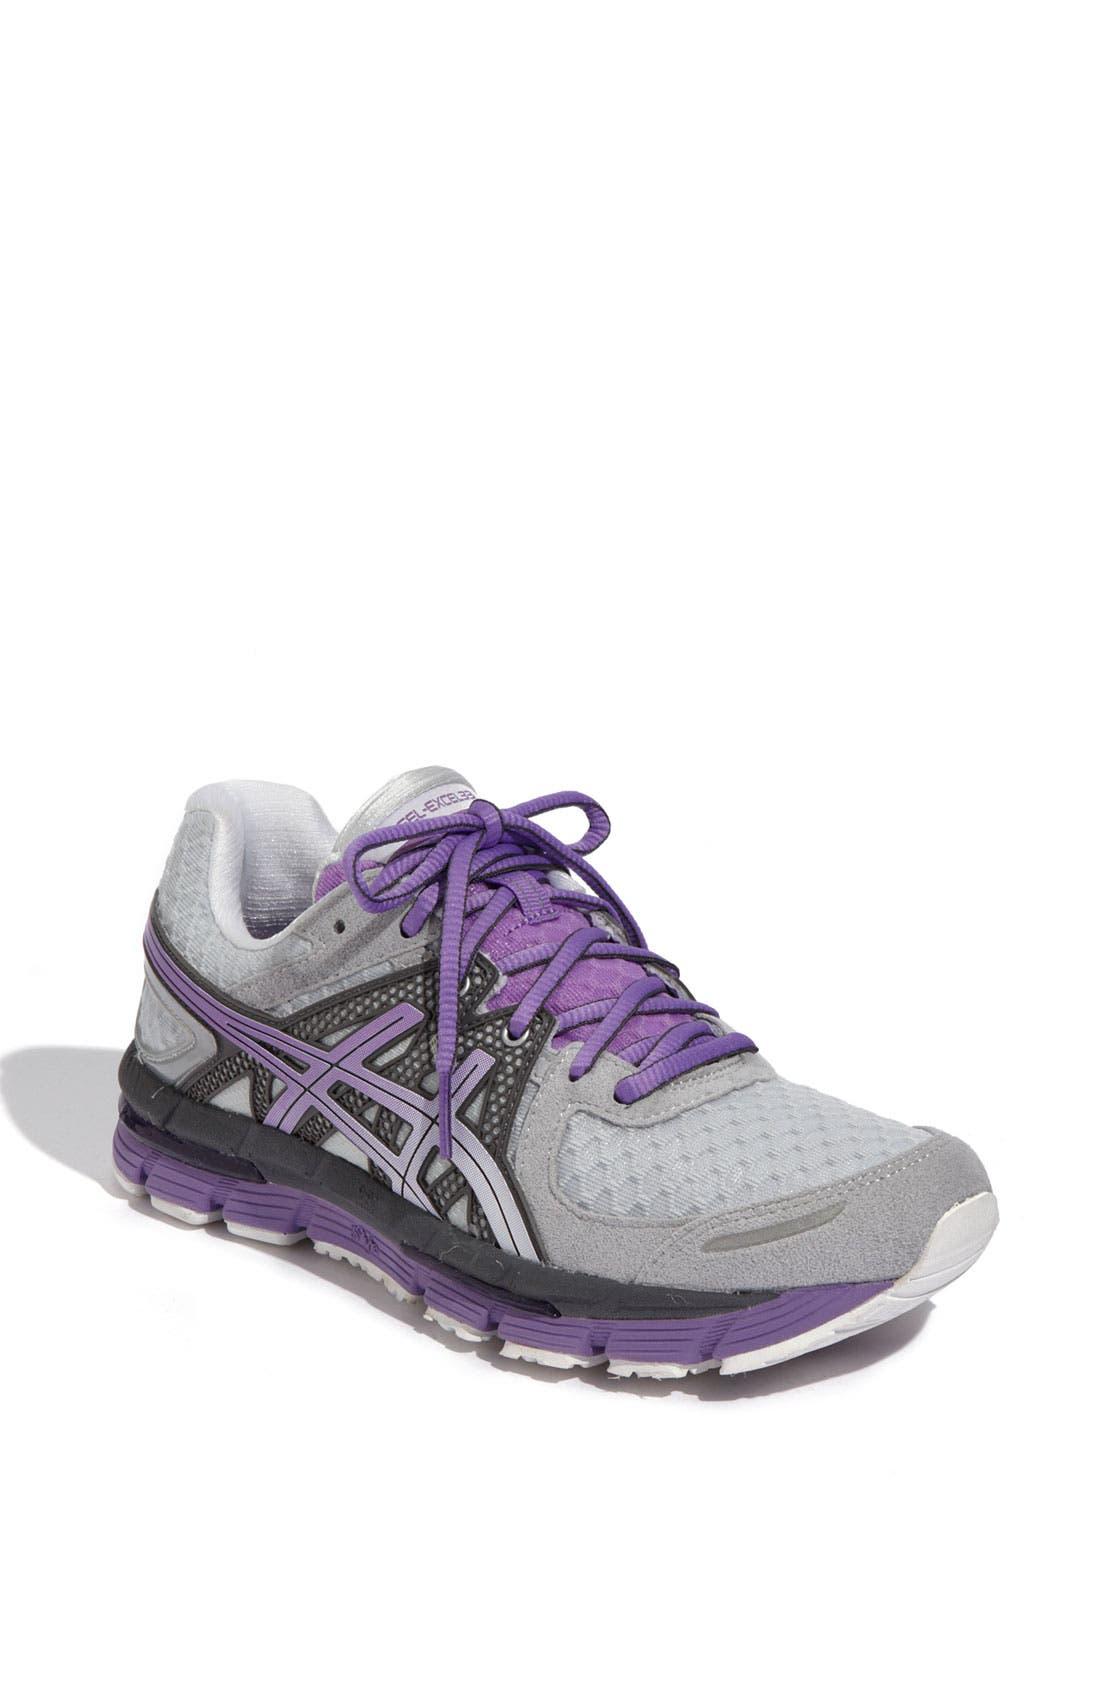 Alternate Image 1 Selected - ASICS® 'GEL-Excel 33' Running Shoe (Women)